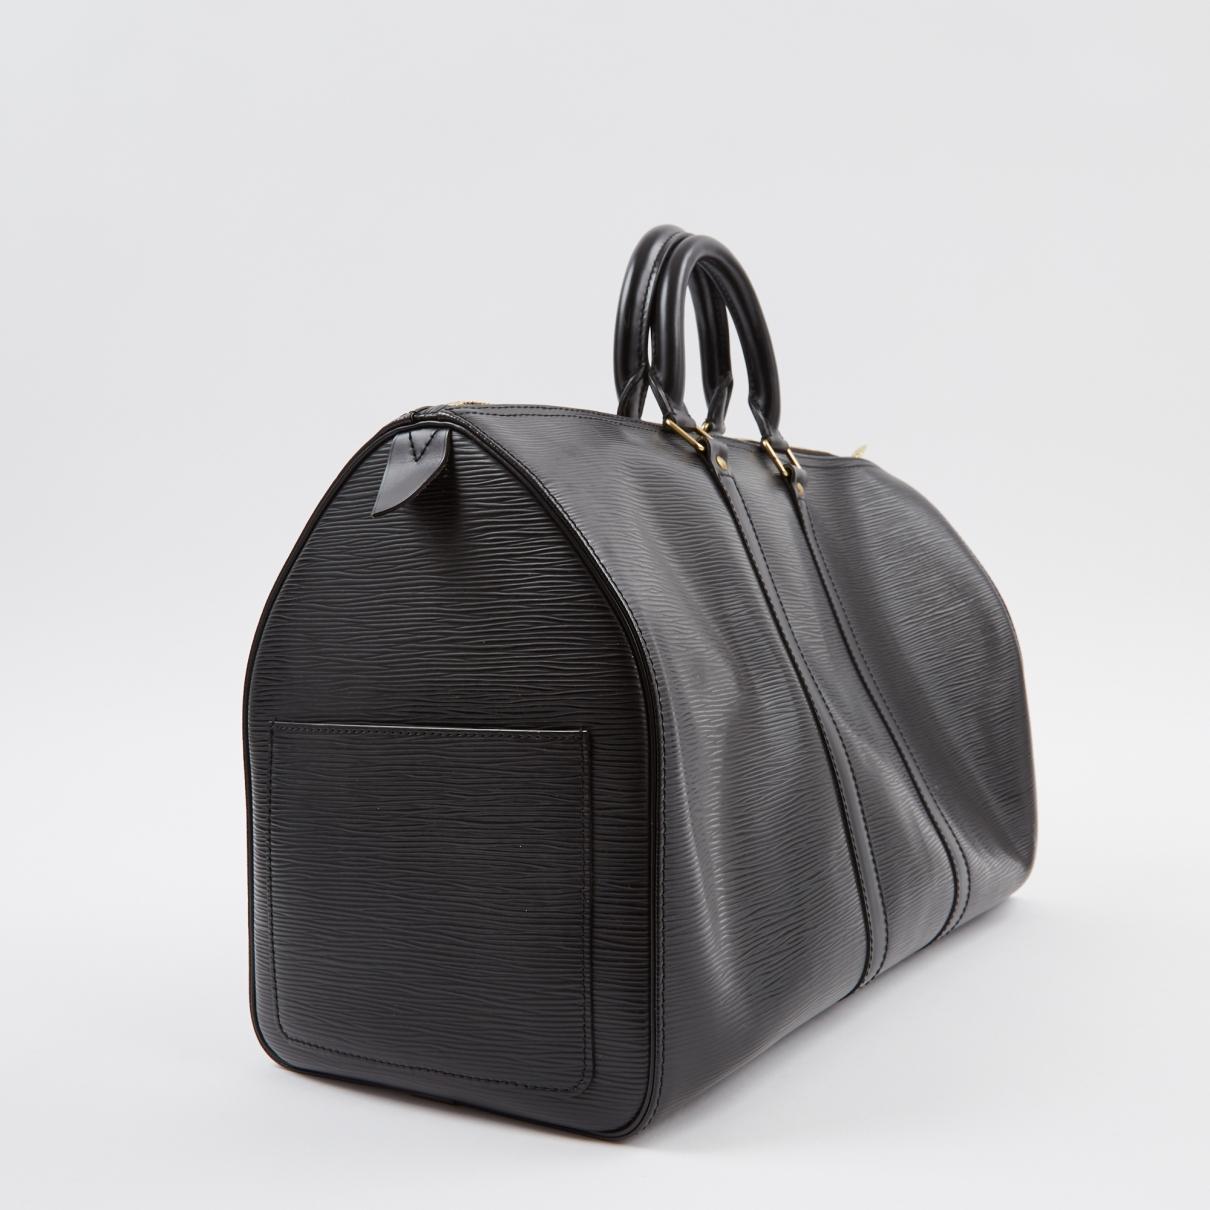 ff464f008a3a Louis Vuitton - Black Keepall Leather Bag for Men - Lyst. View fullscreen